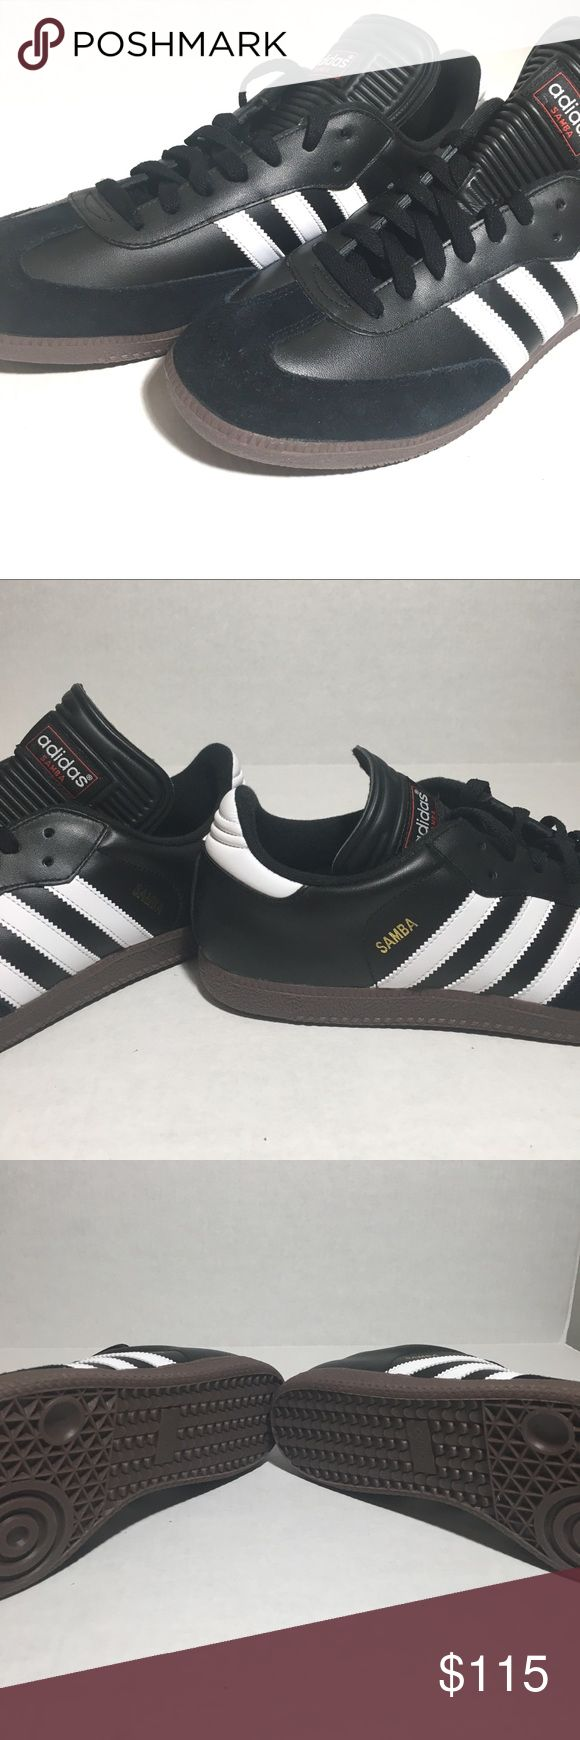 Adidas Samba Classic 034563 Black White Mens sz 12 Adidas Samba Classic 034563 Black White Mens US size 12  Offers welcome adidas Shoes Sneakers